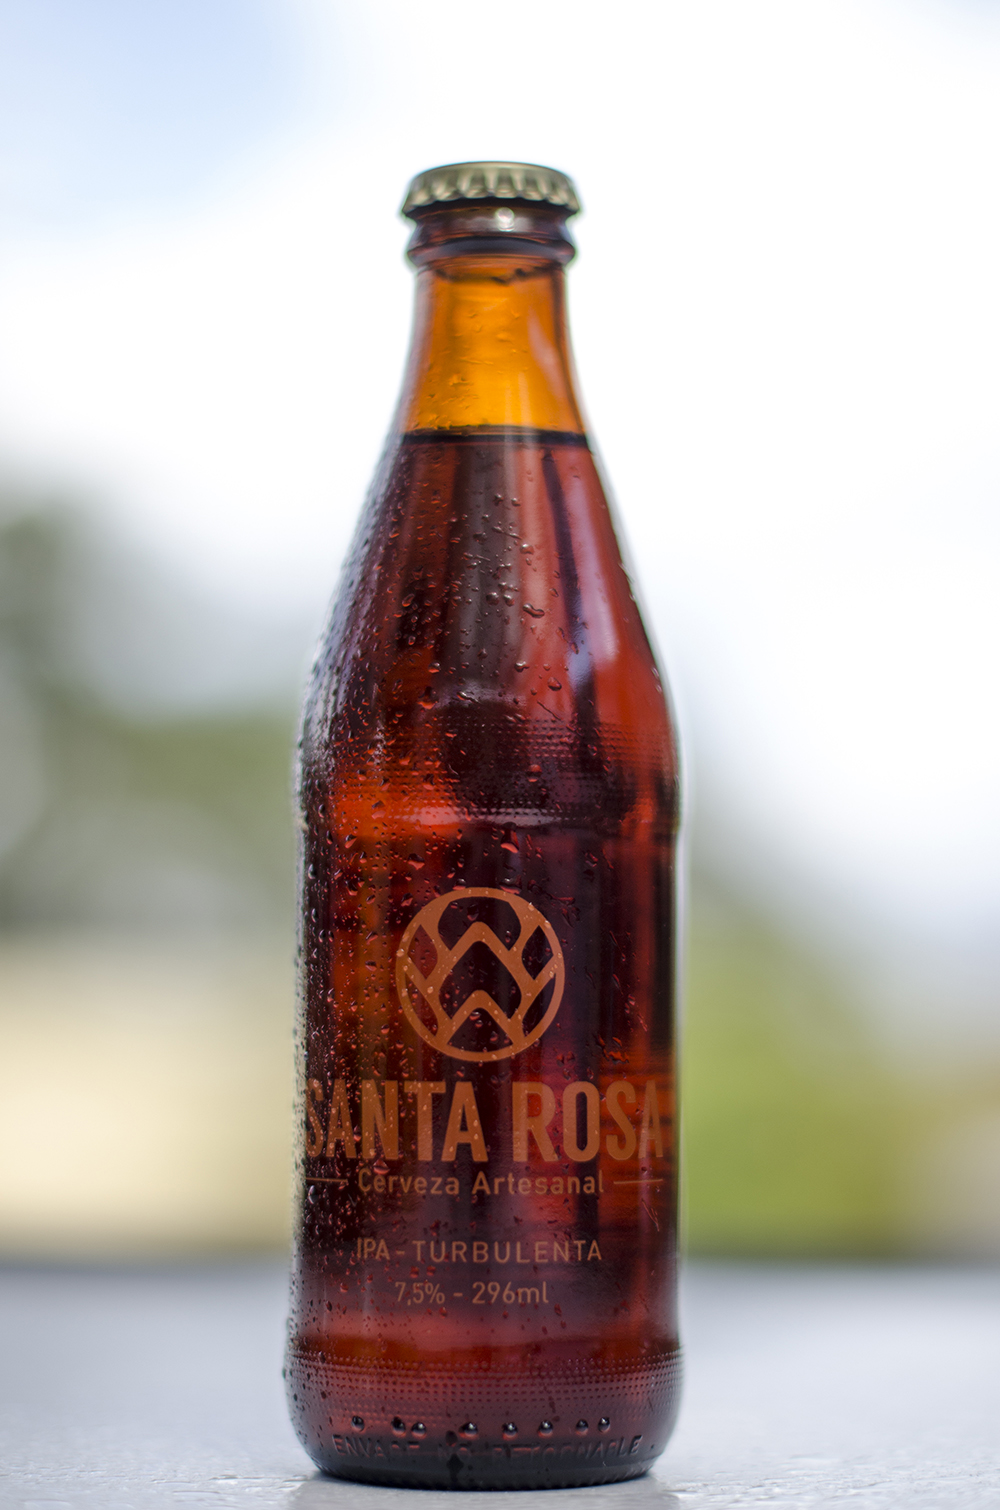 55 Cervecería  - Santa Rosa  IPA Turbulenta  7,5%